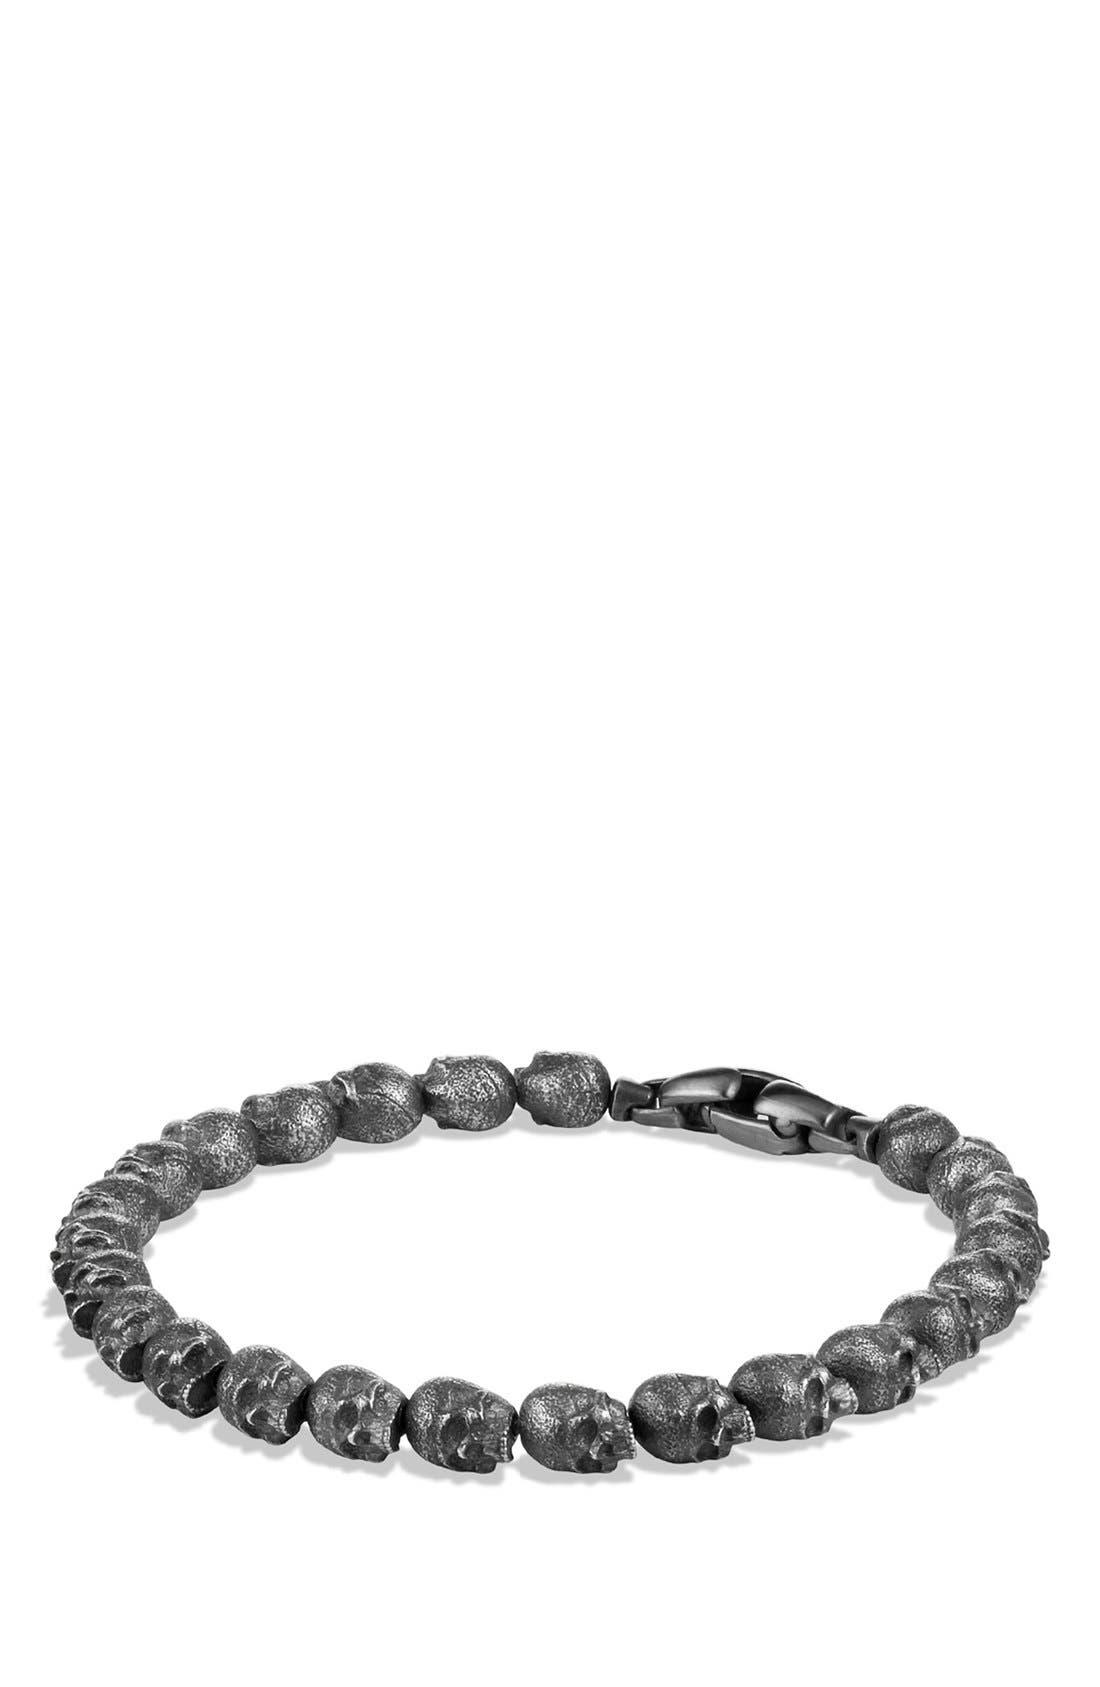 'Spiritual Beads' Bracelet in Silver,                             Main thumbnail 1, color,                             Silver